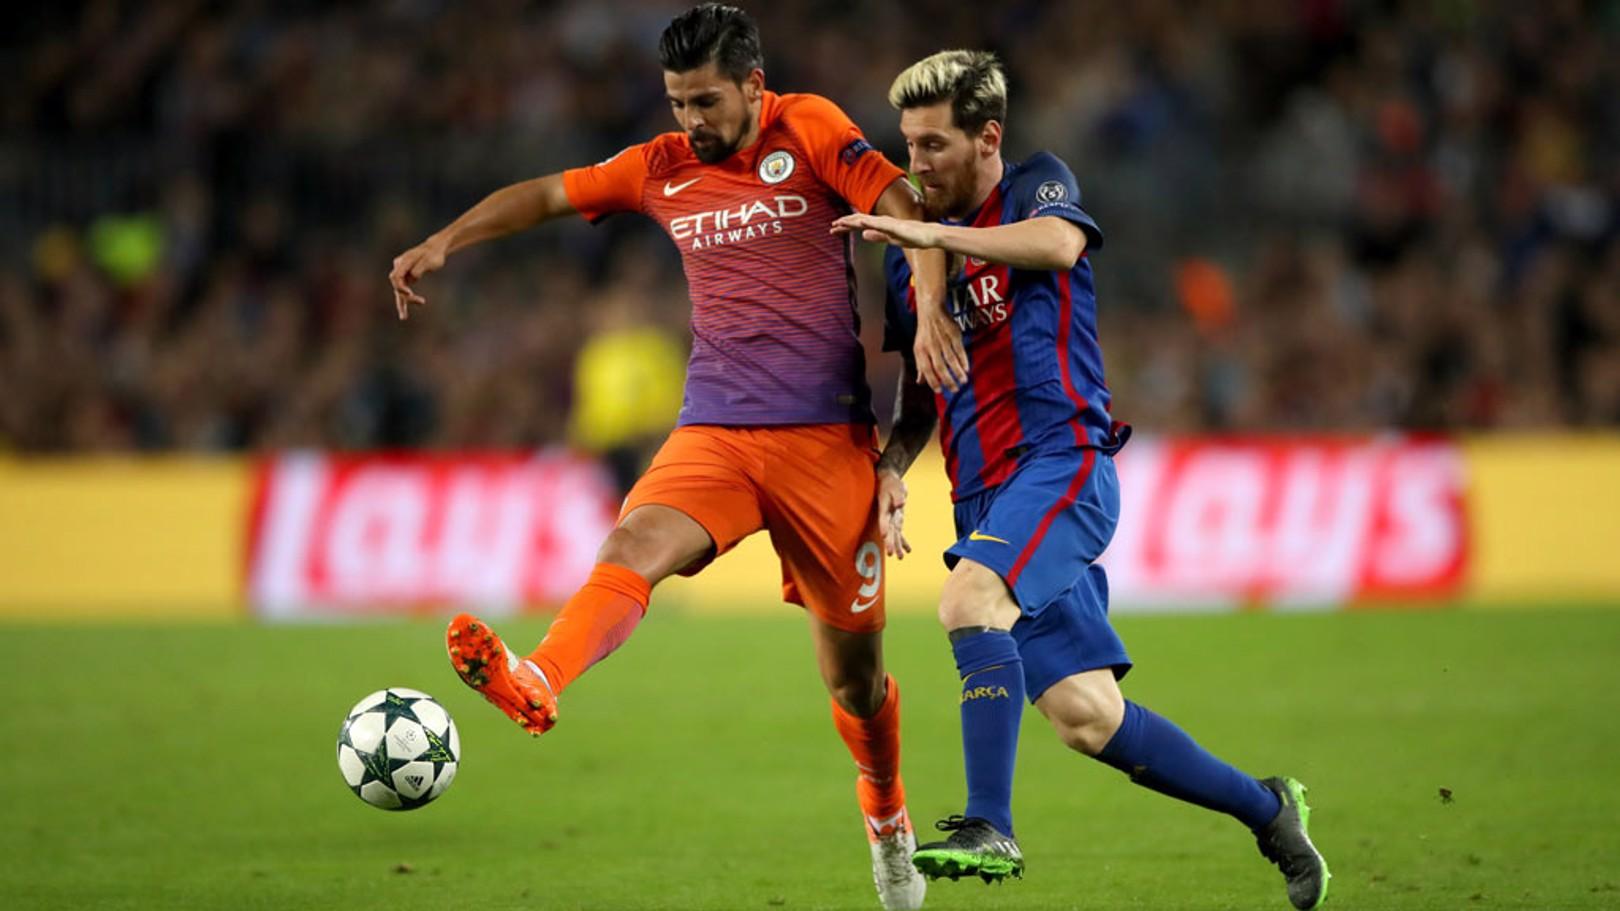 COMPETE - Manchester City's Nolito and Barcelona's Lionel Messi compete for the ball